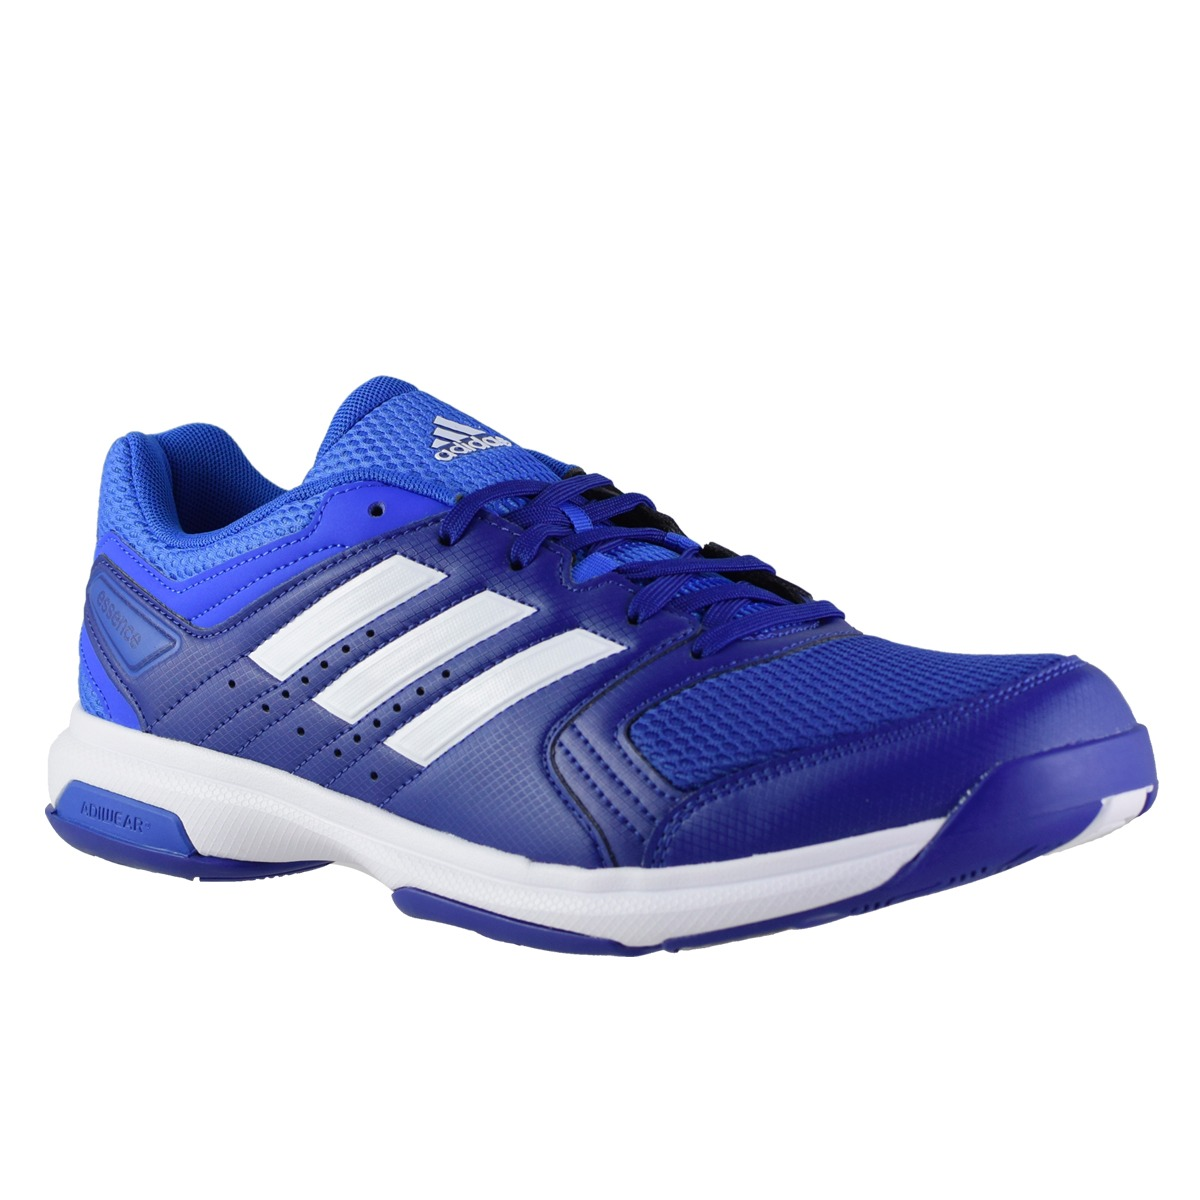 new concept b3142 9bf2c zapatillas adidas essence handball hombre azul. Cargando zoom.